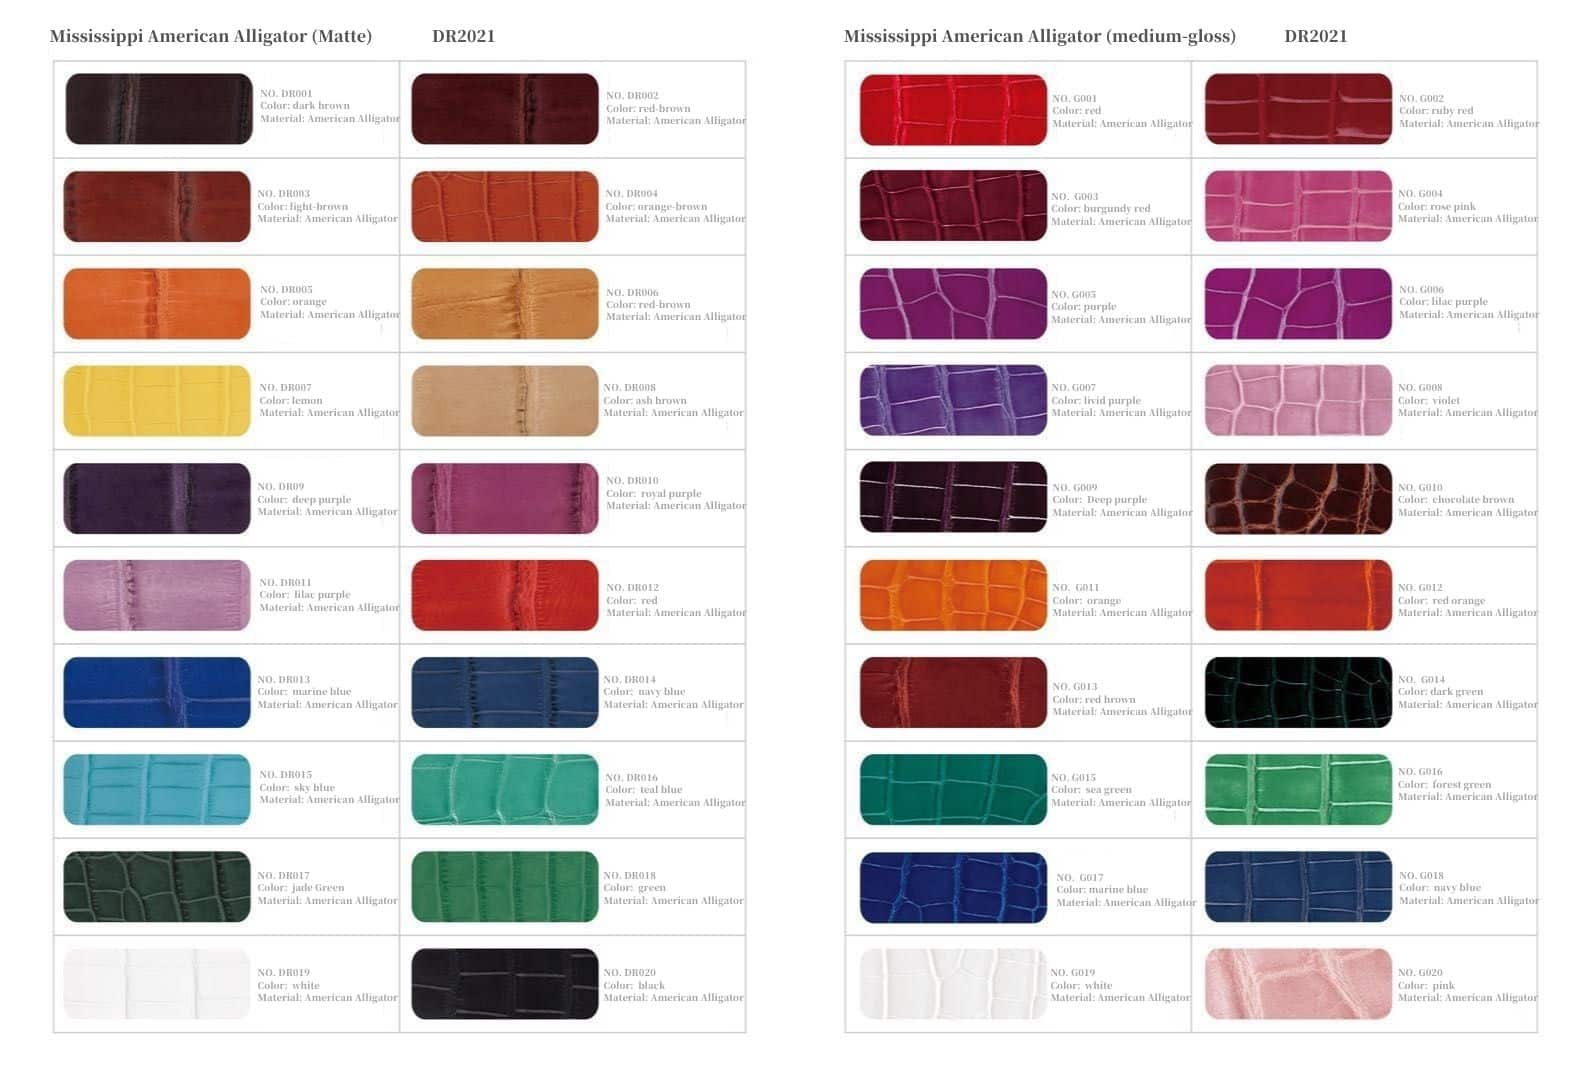 Drwatchstrap color optional - American Alligator